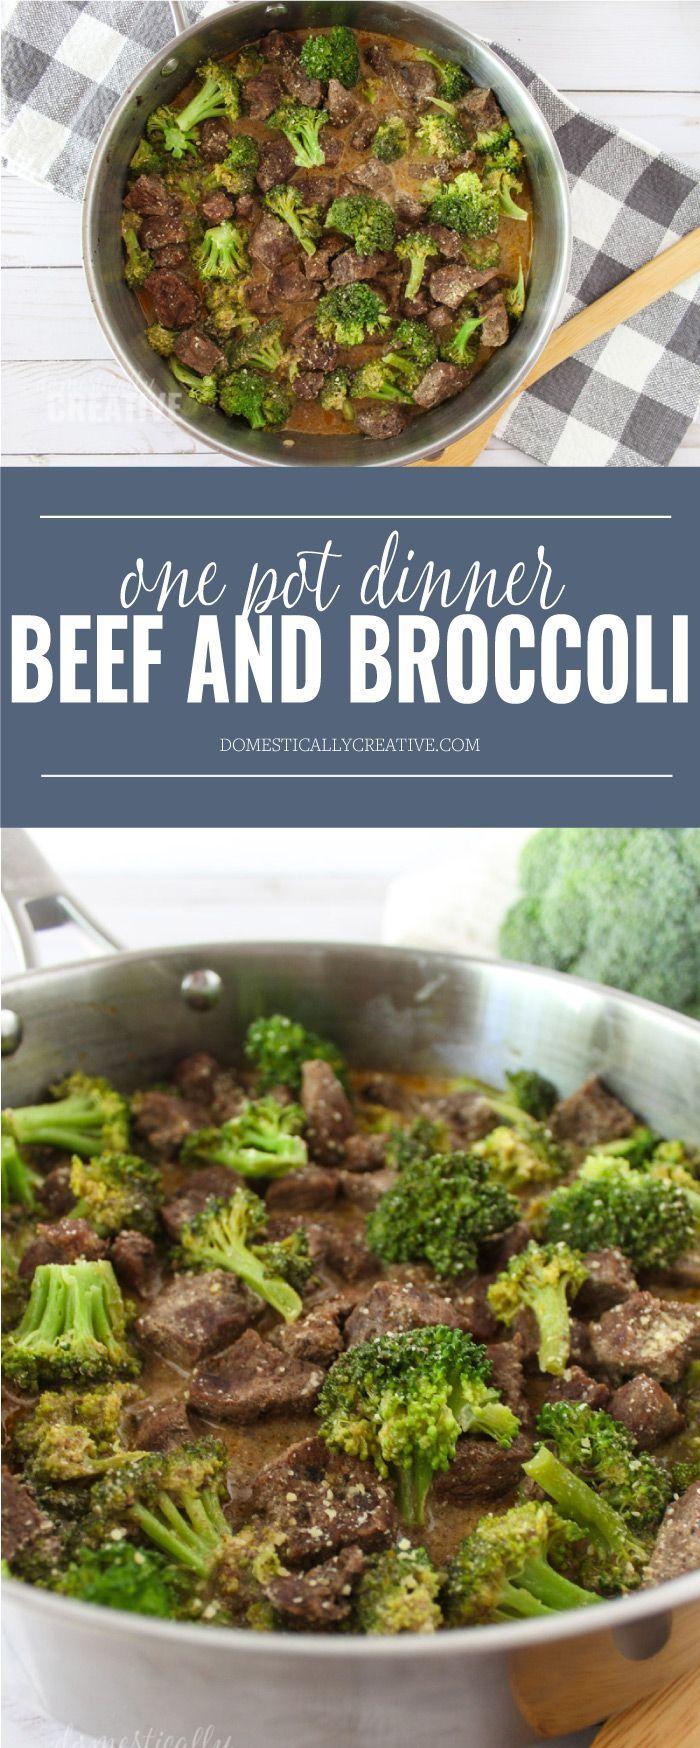 Easy Keto Broccoli Cheese Slow Cooker Soup!